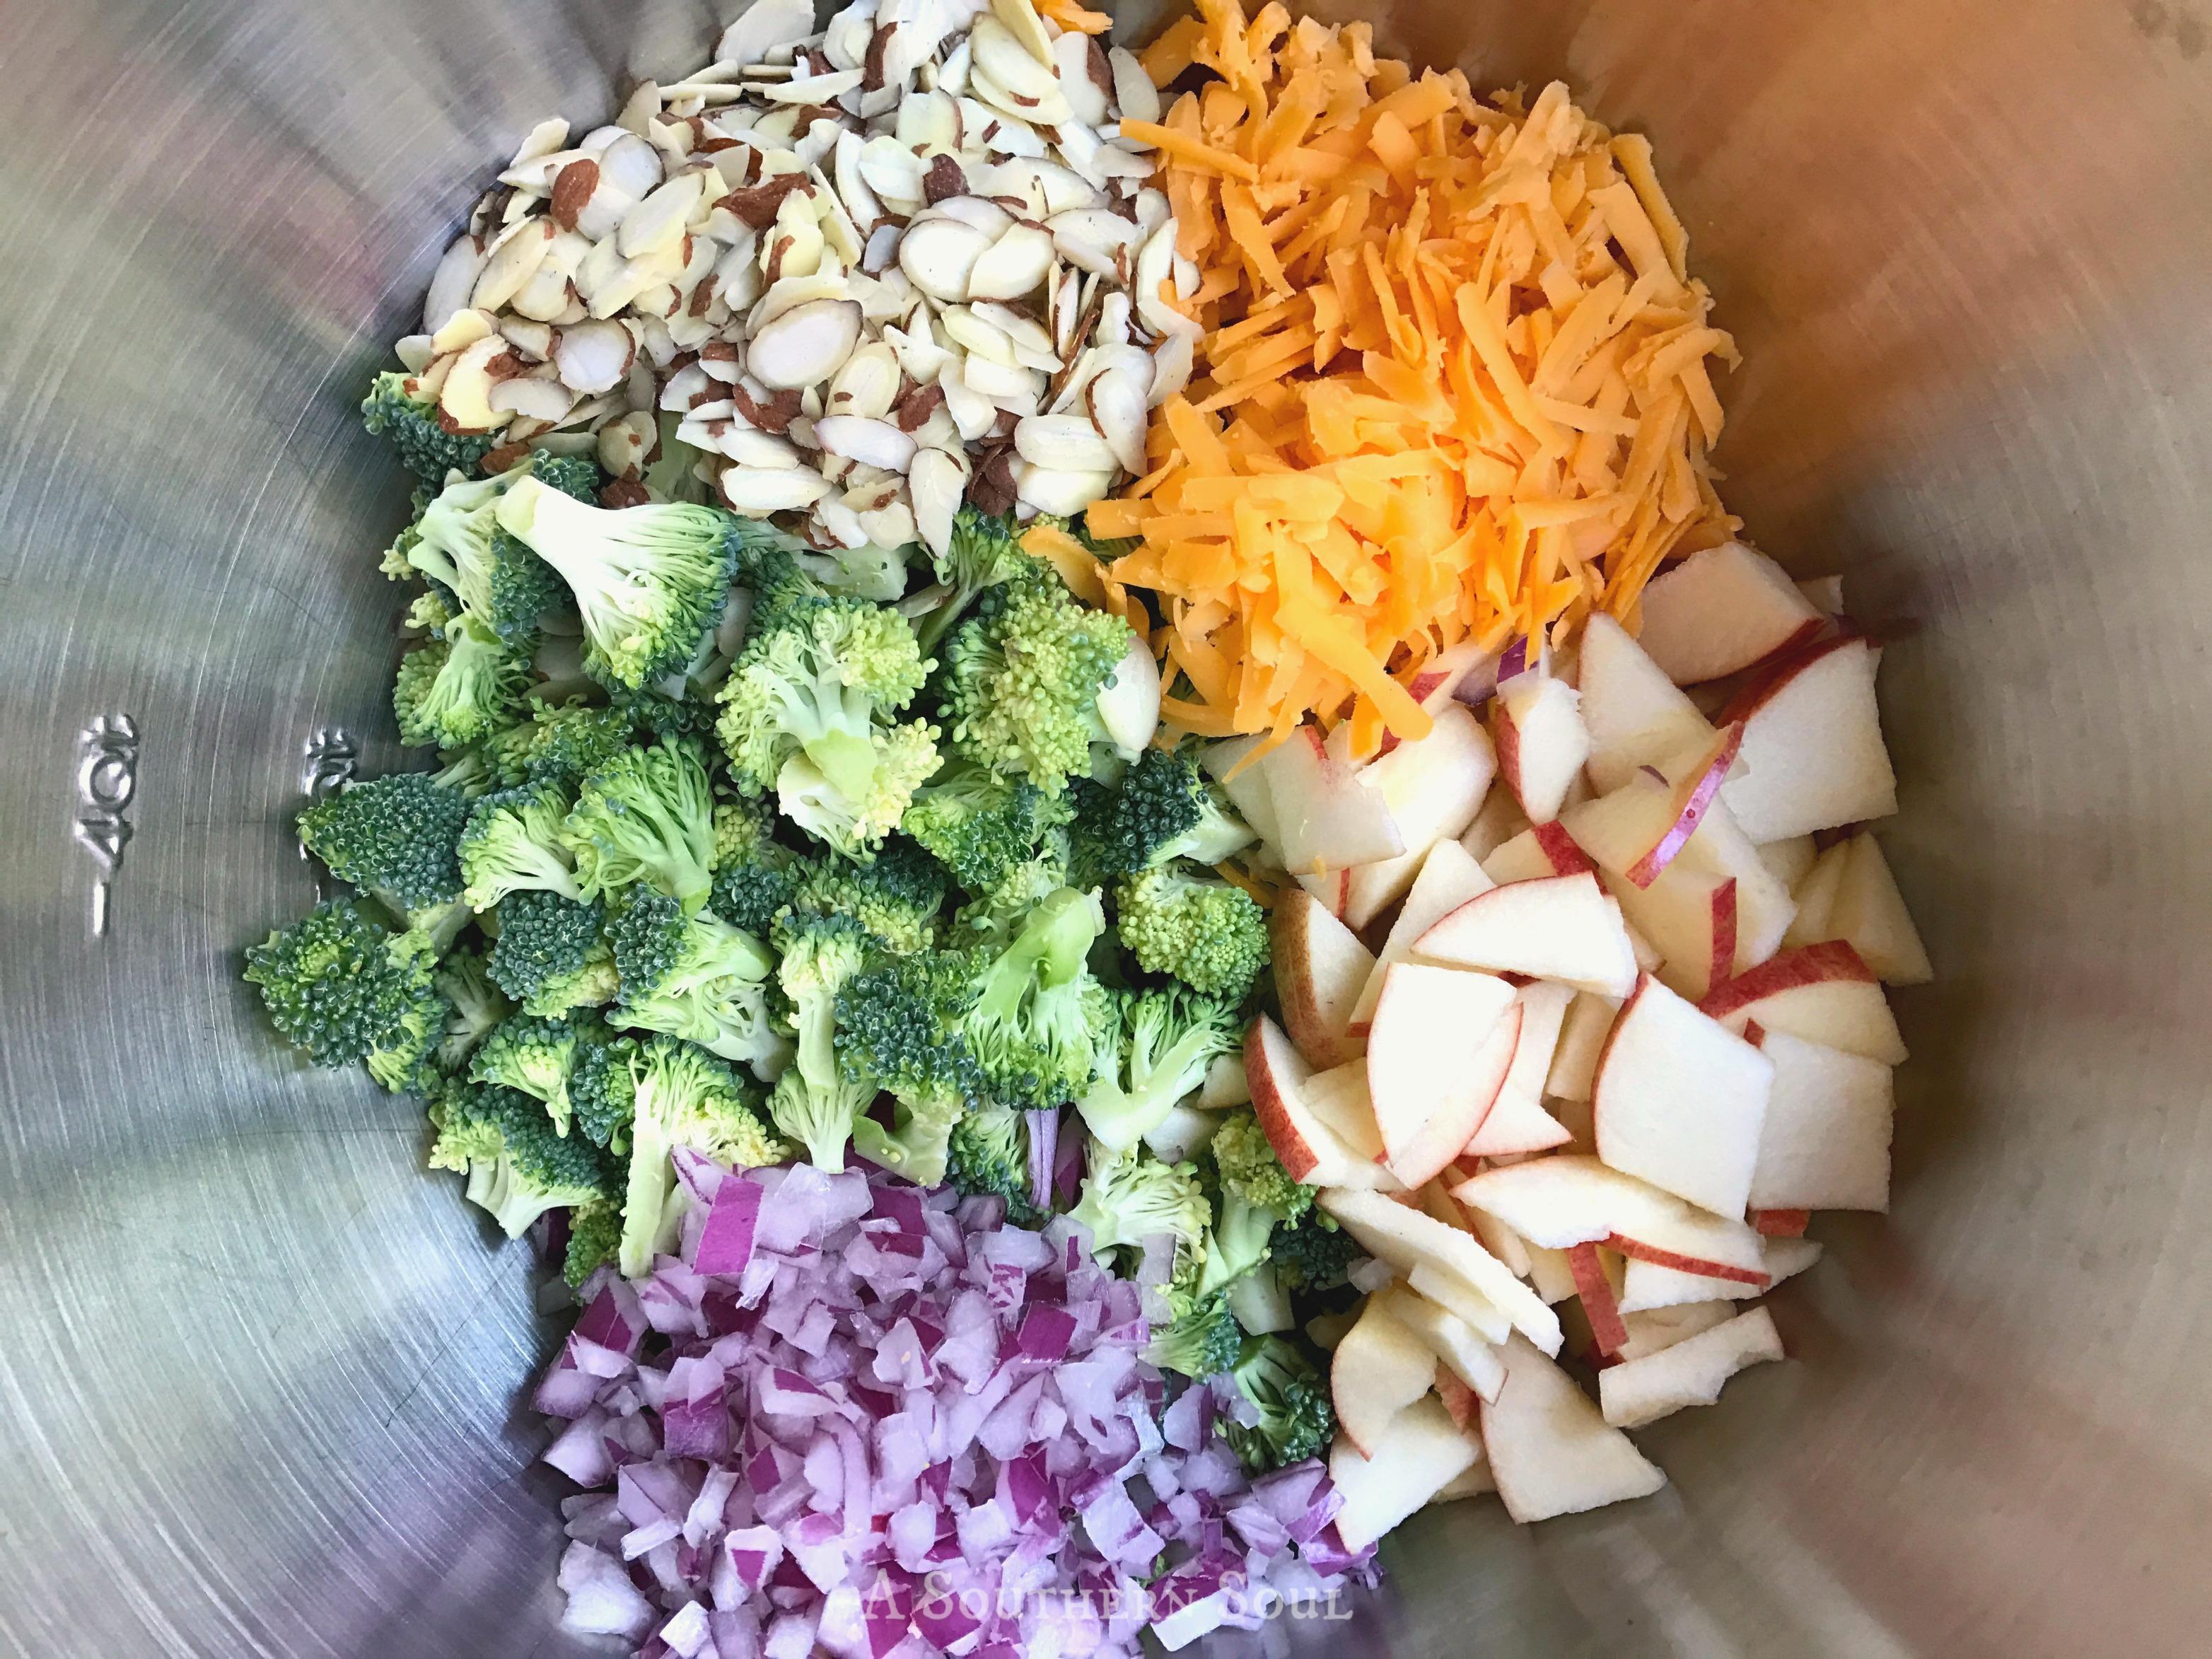 Broccoli Apple Salad Ingredients